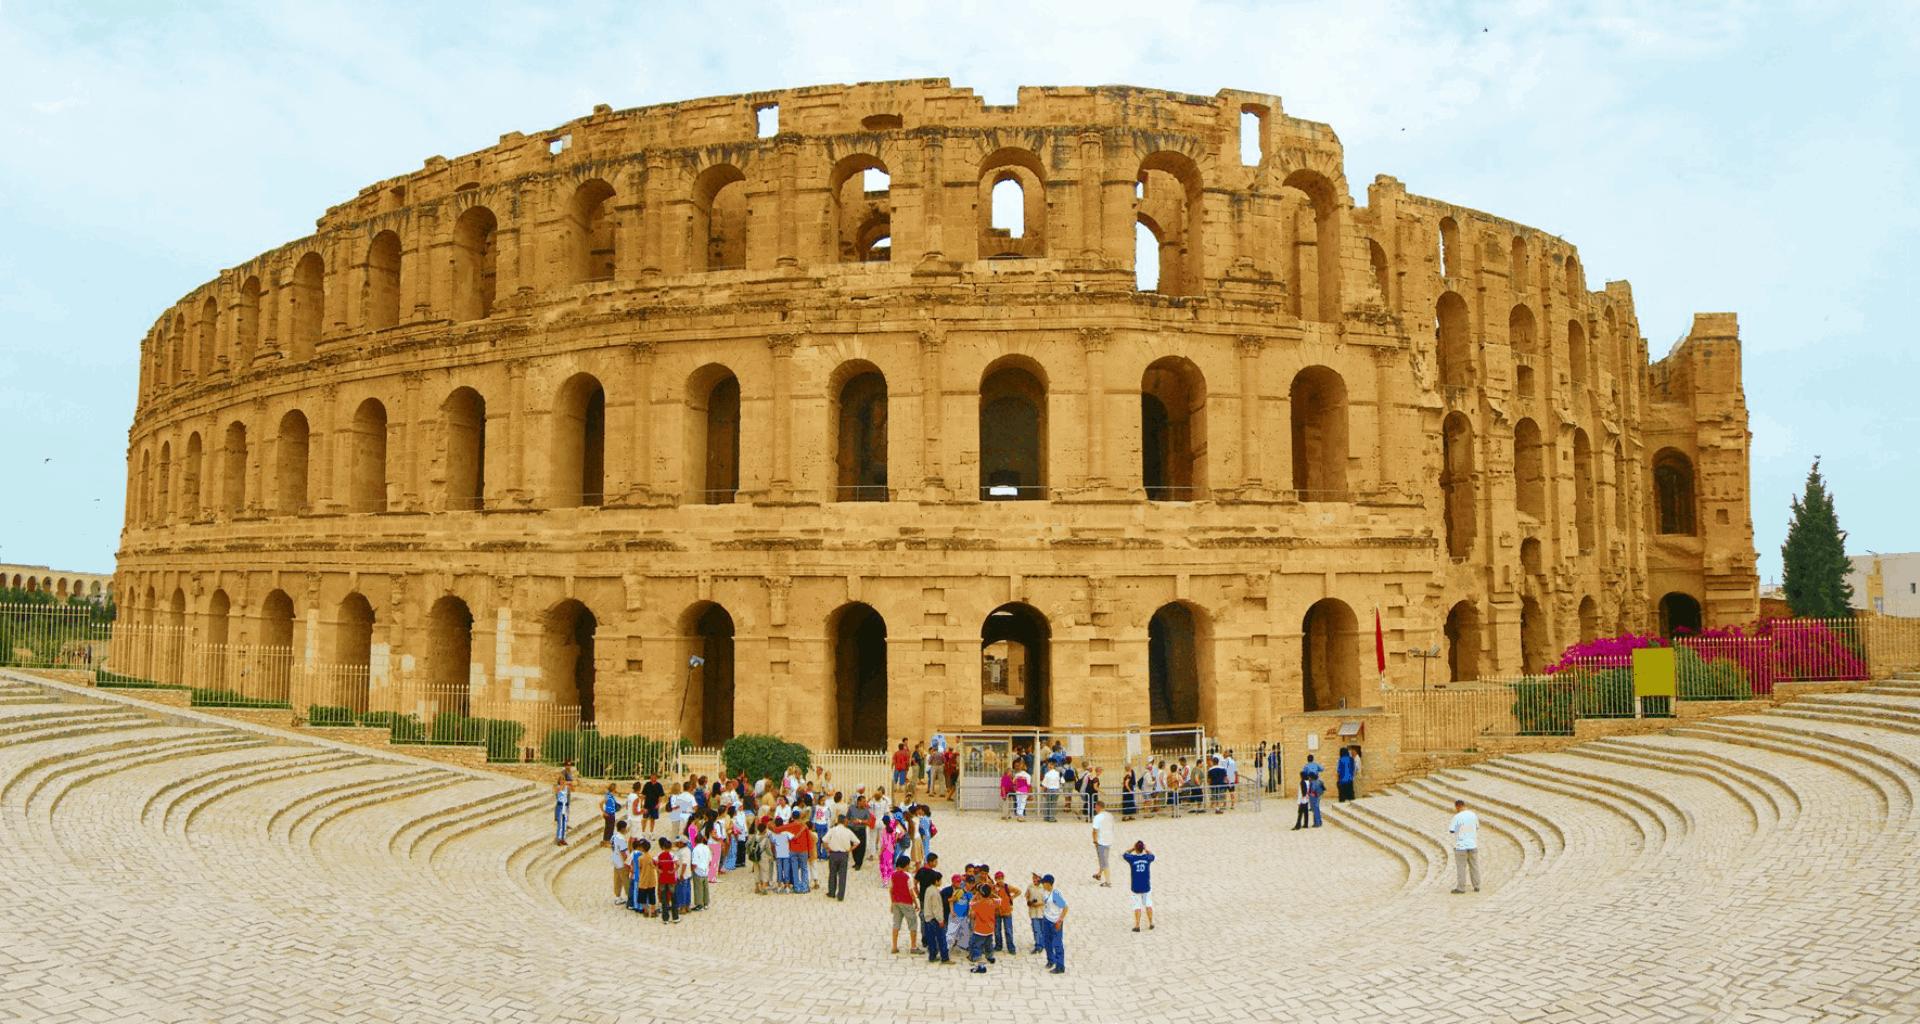 El Jem Archaeological Museum